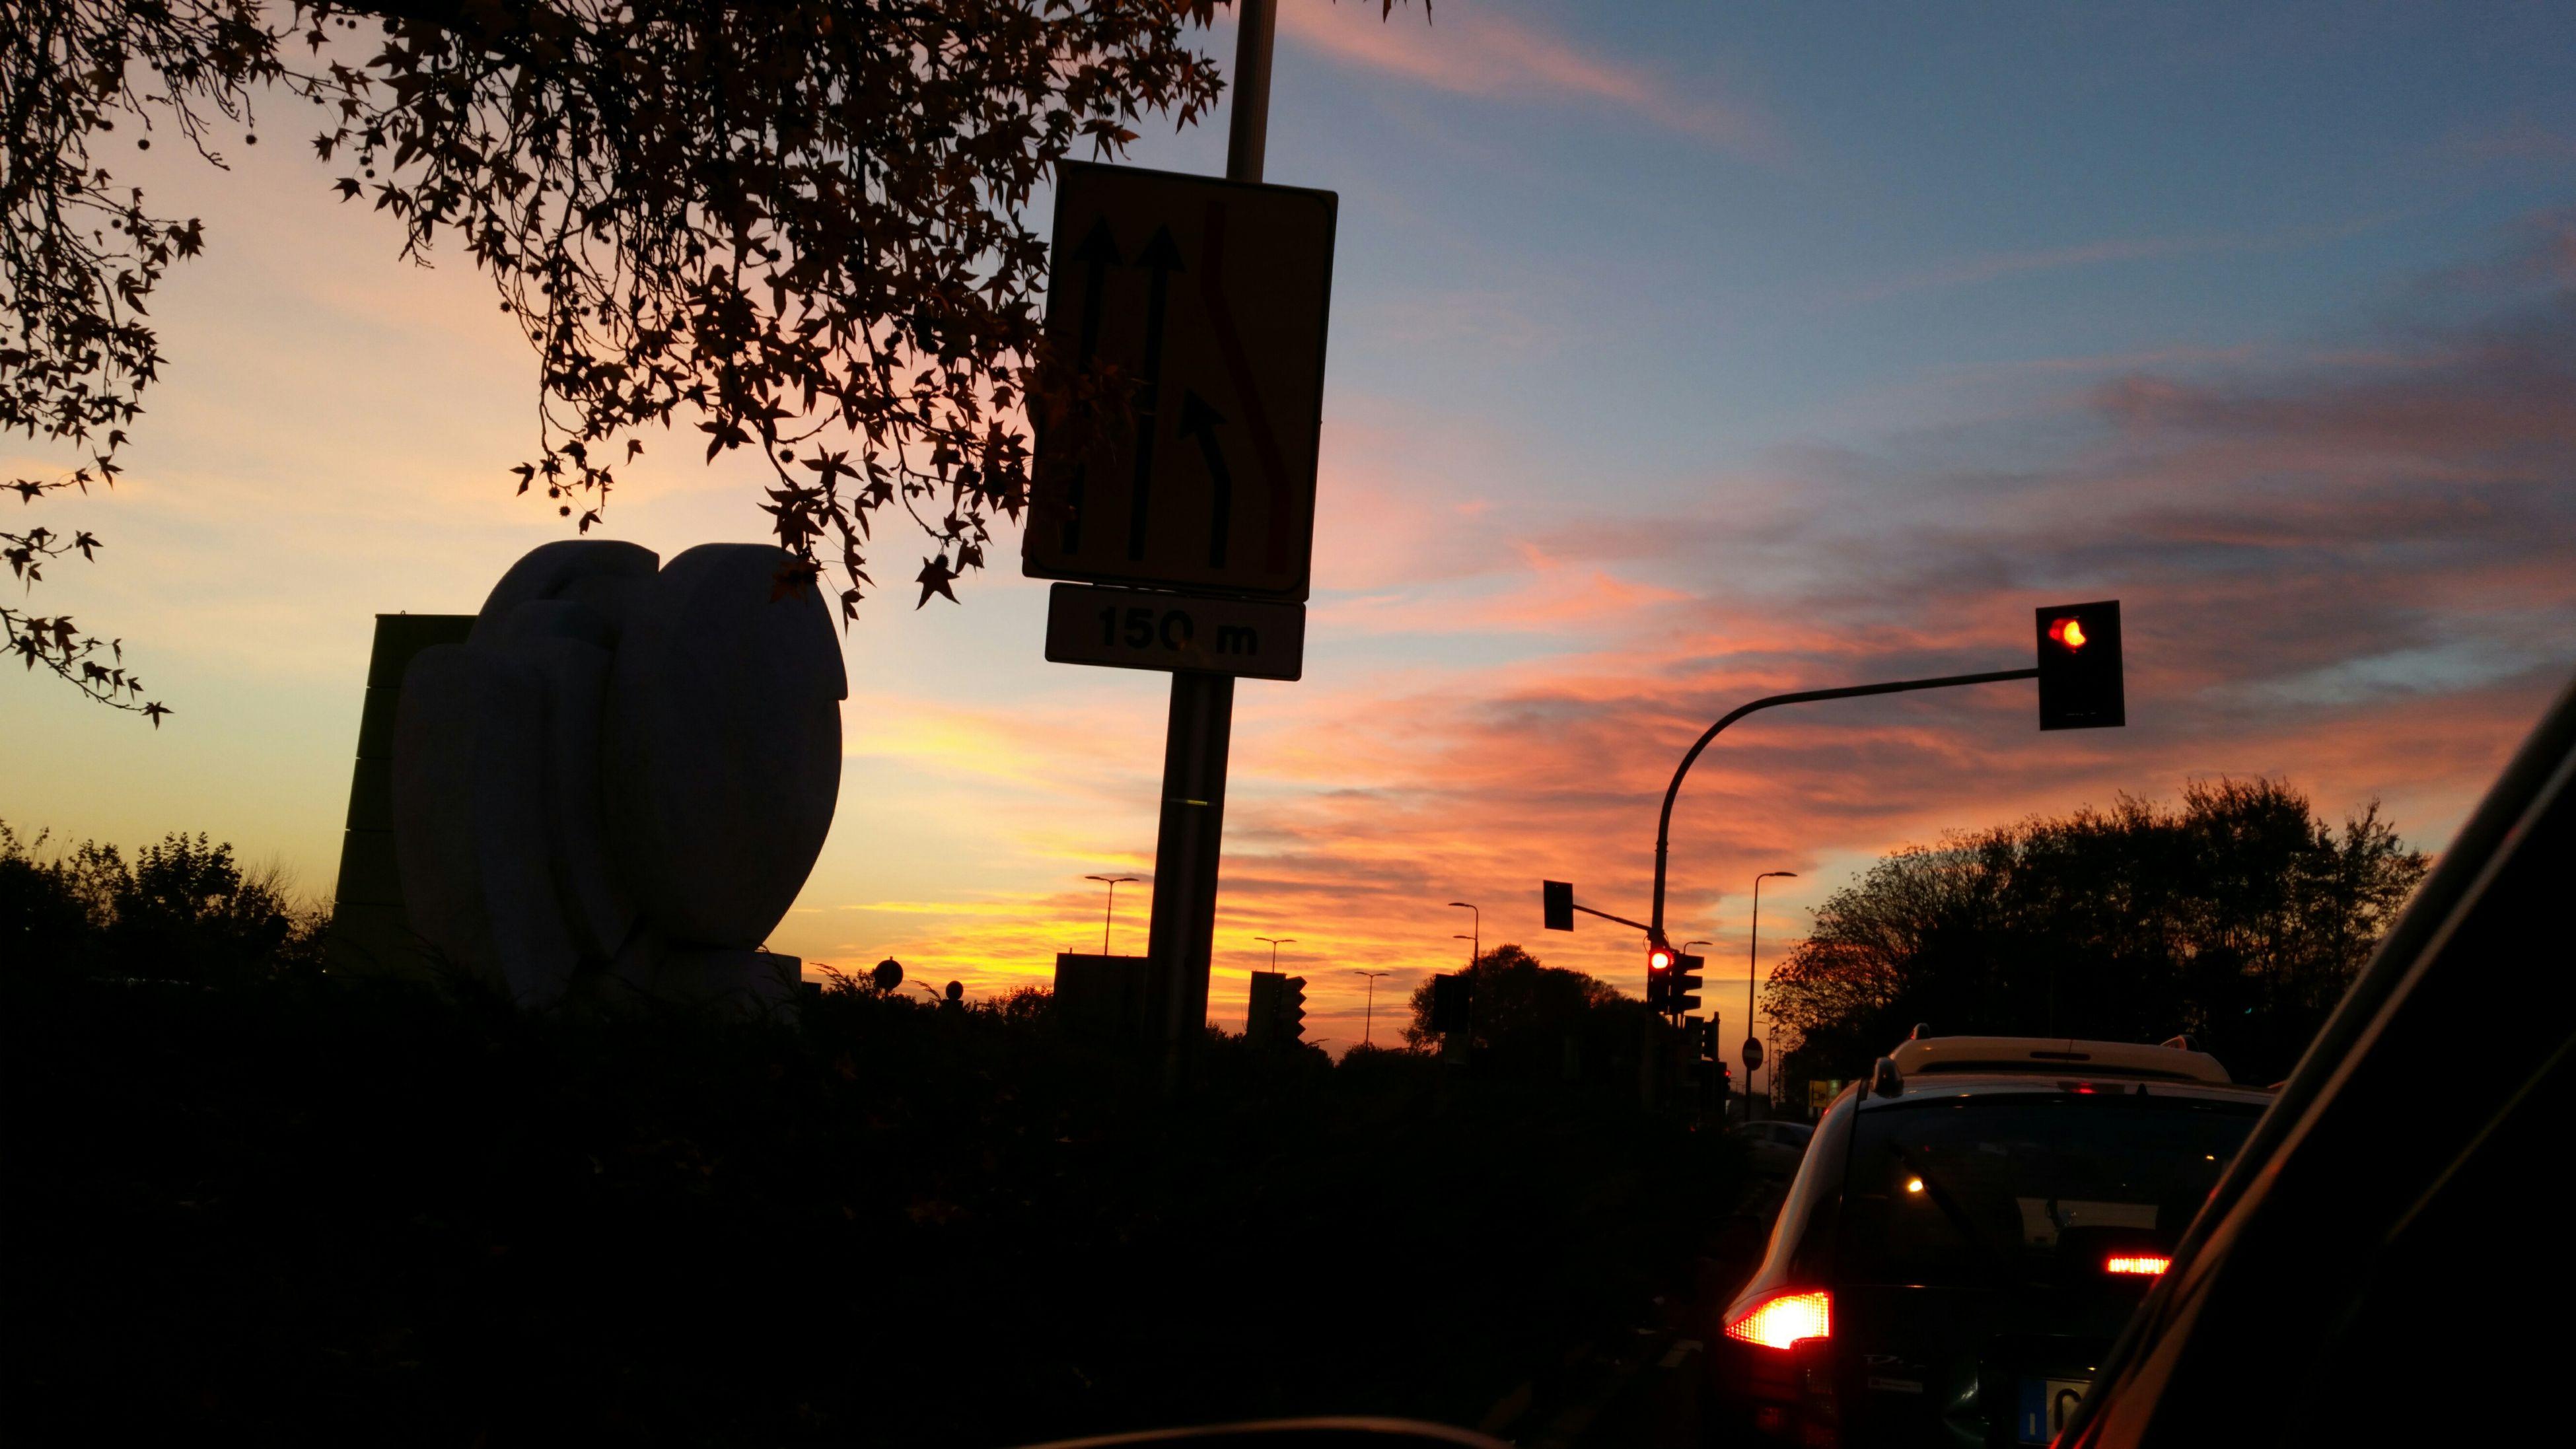 silhouette, sunset, tree, sky, communication, street light, building exterior, built structure, road sign, architecture, cloud - sky, dusk, low angle view, orange color, city, guidance, car, cloud, dark, street